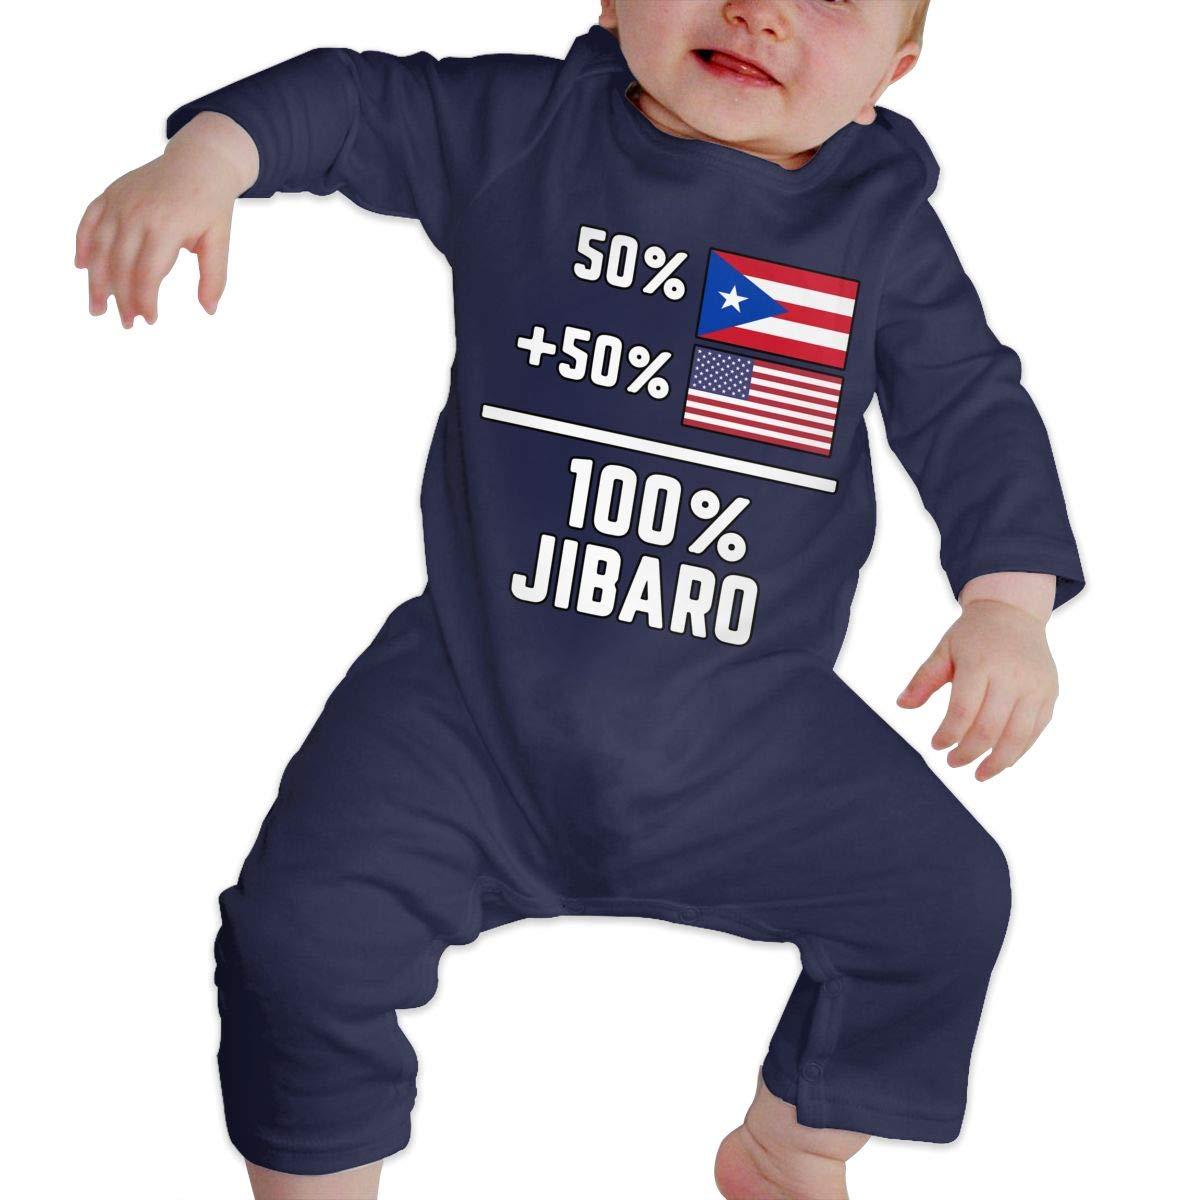 LBJQ8 Puerto Rican American Jibaro Pride Toddler Baby Girls Sleep and Play Jumpsuit Overall Romper